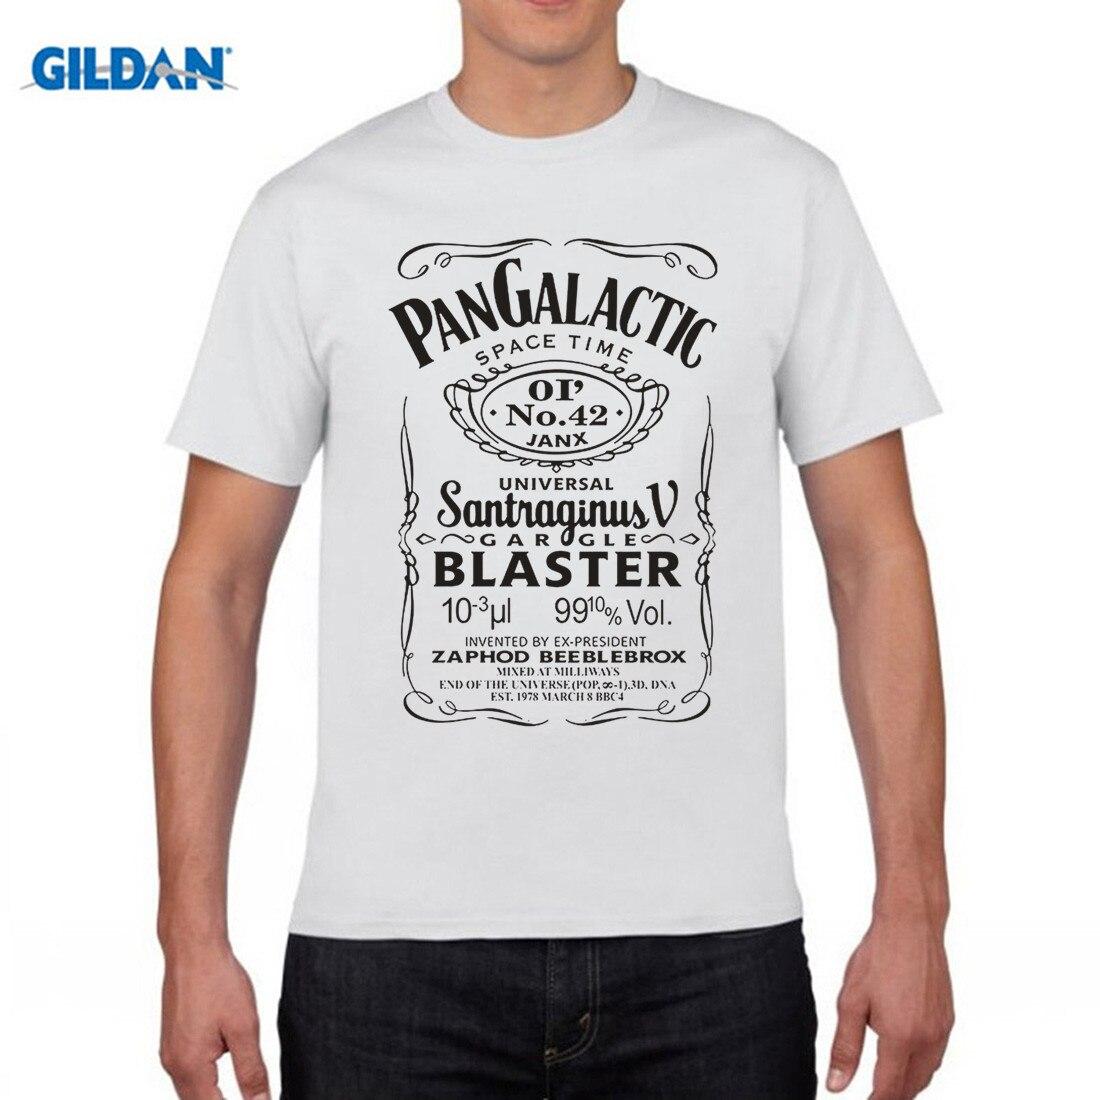 GILDAN Pan Galactic Gargle Blaster T-Shirt 100% Cotton Douglas Adams 2017 Brand T Shirt Men Fashion Cotton Men Short Sleeve